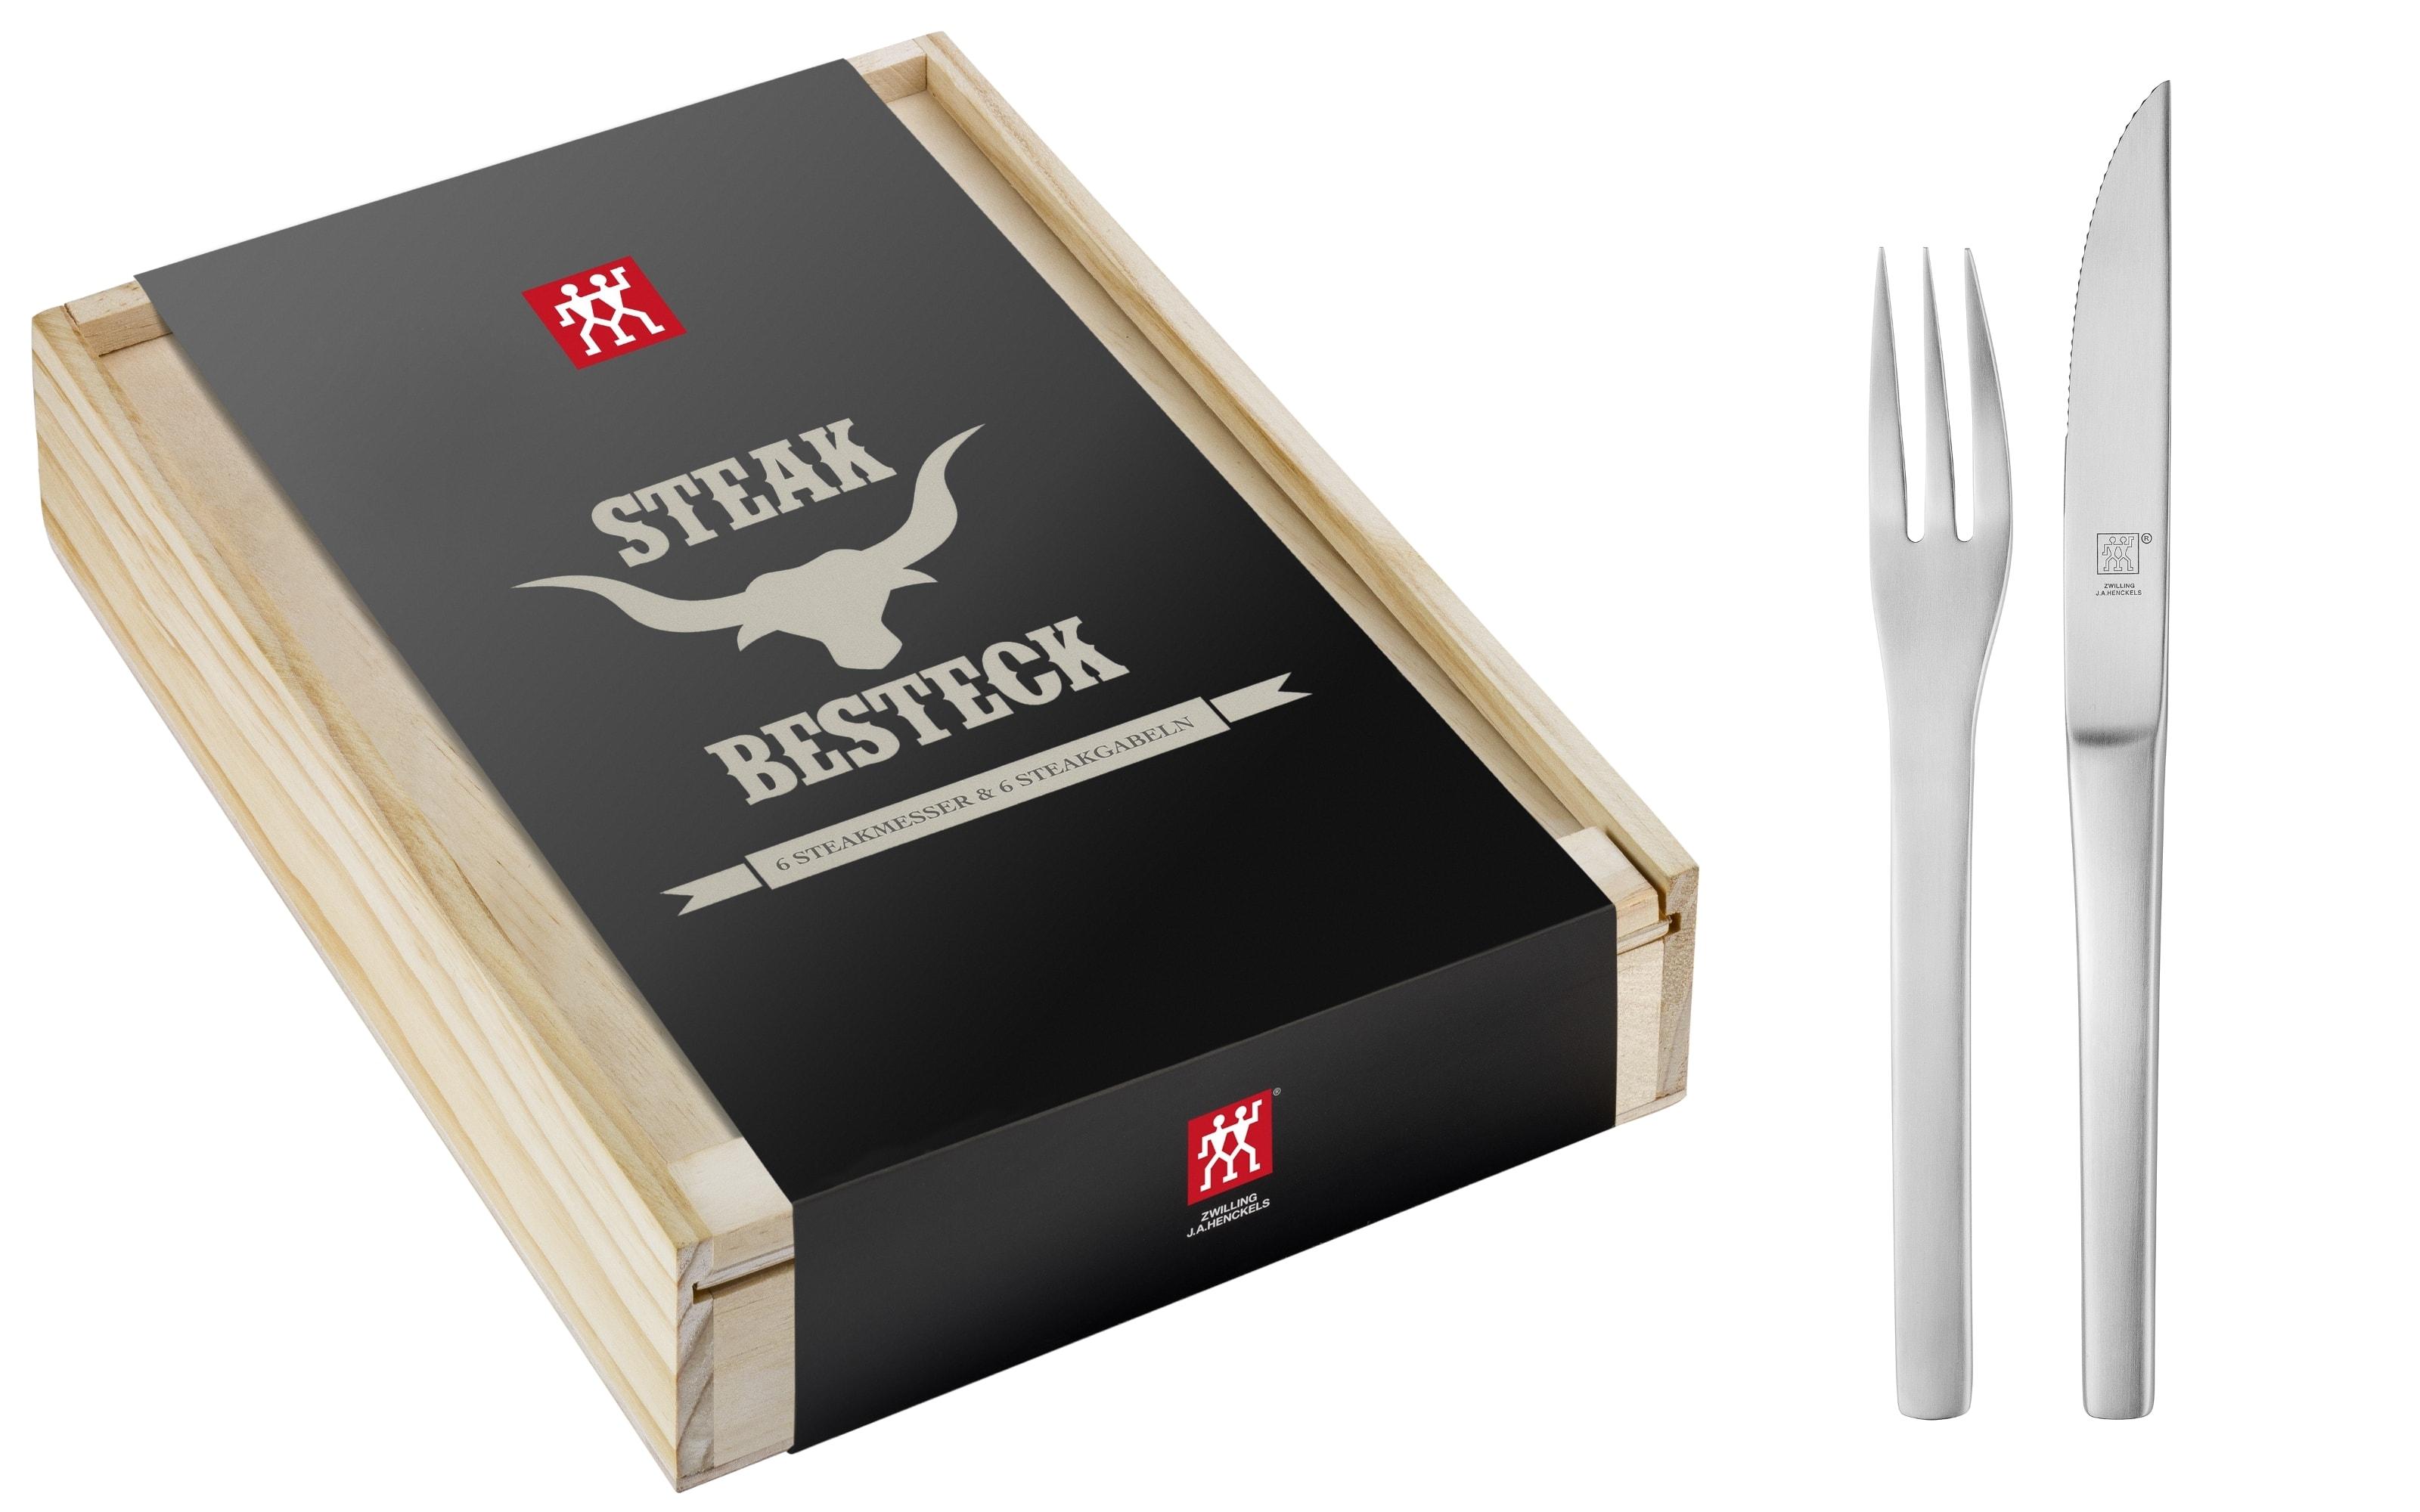 Steakbesteck Melbourne in Holzbox, 12-teilig